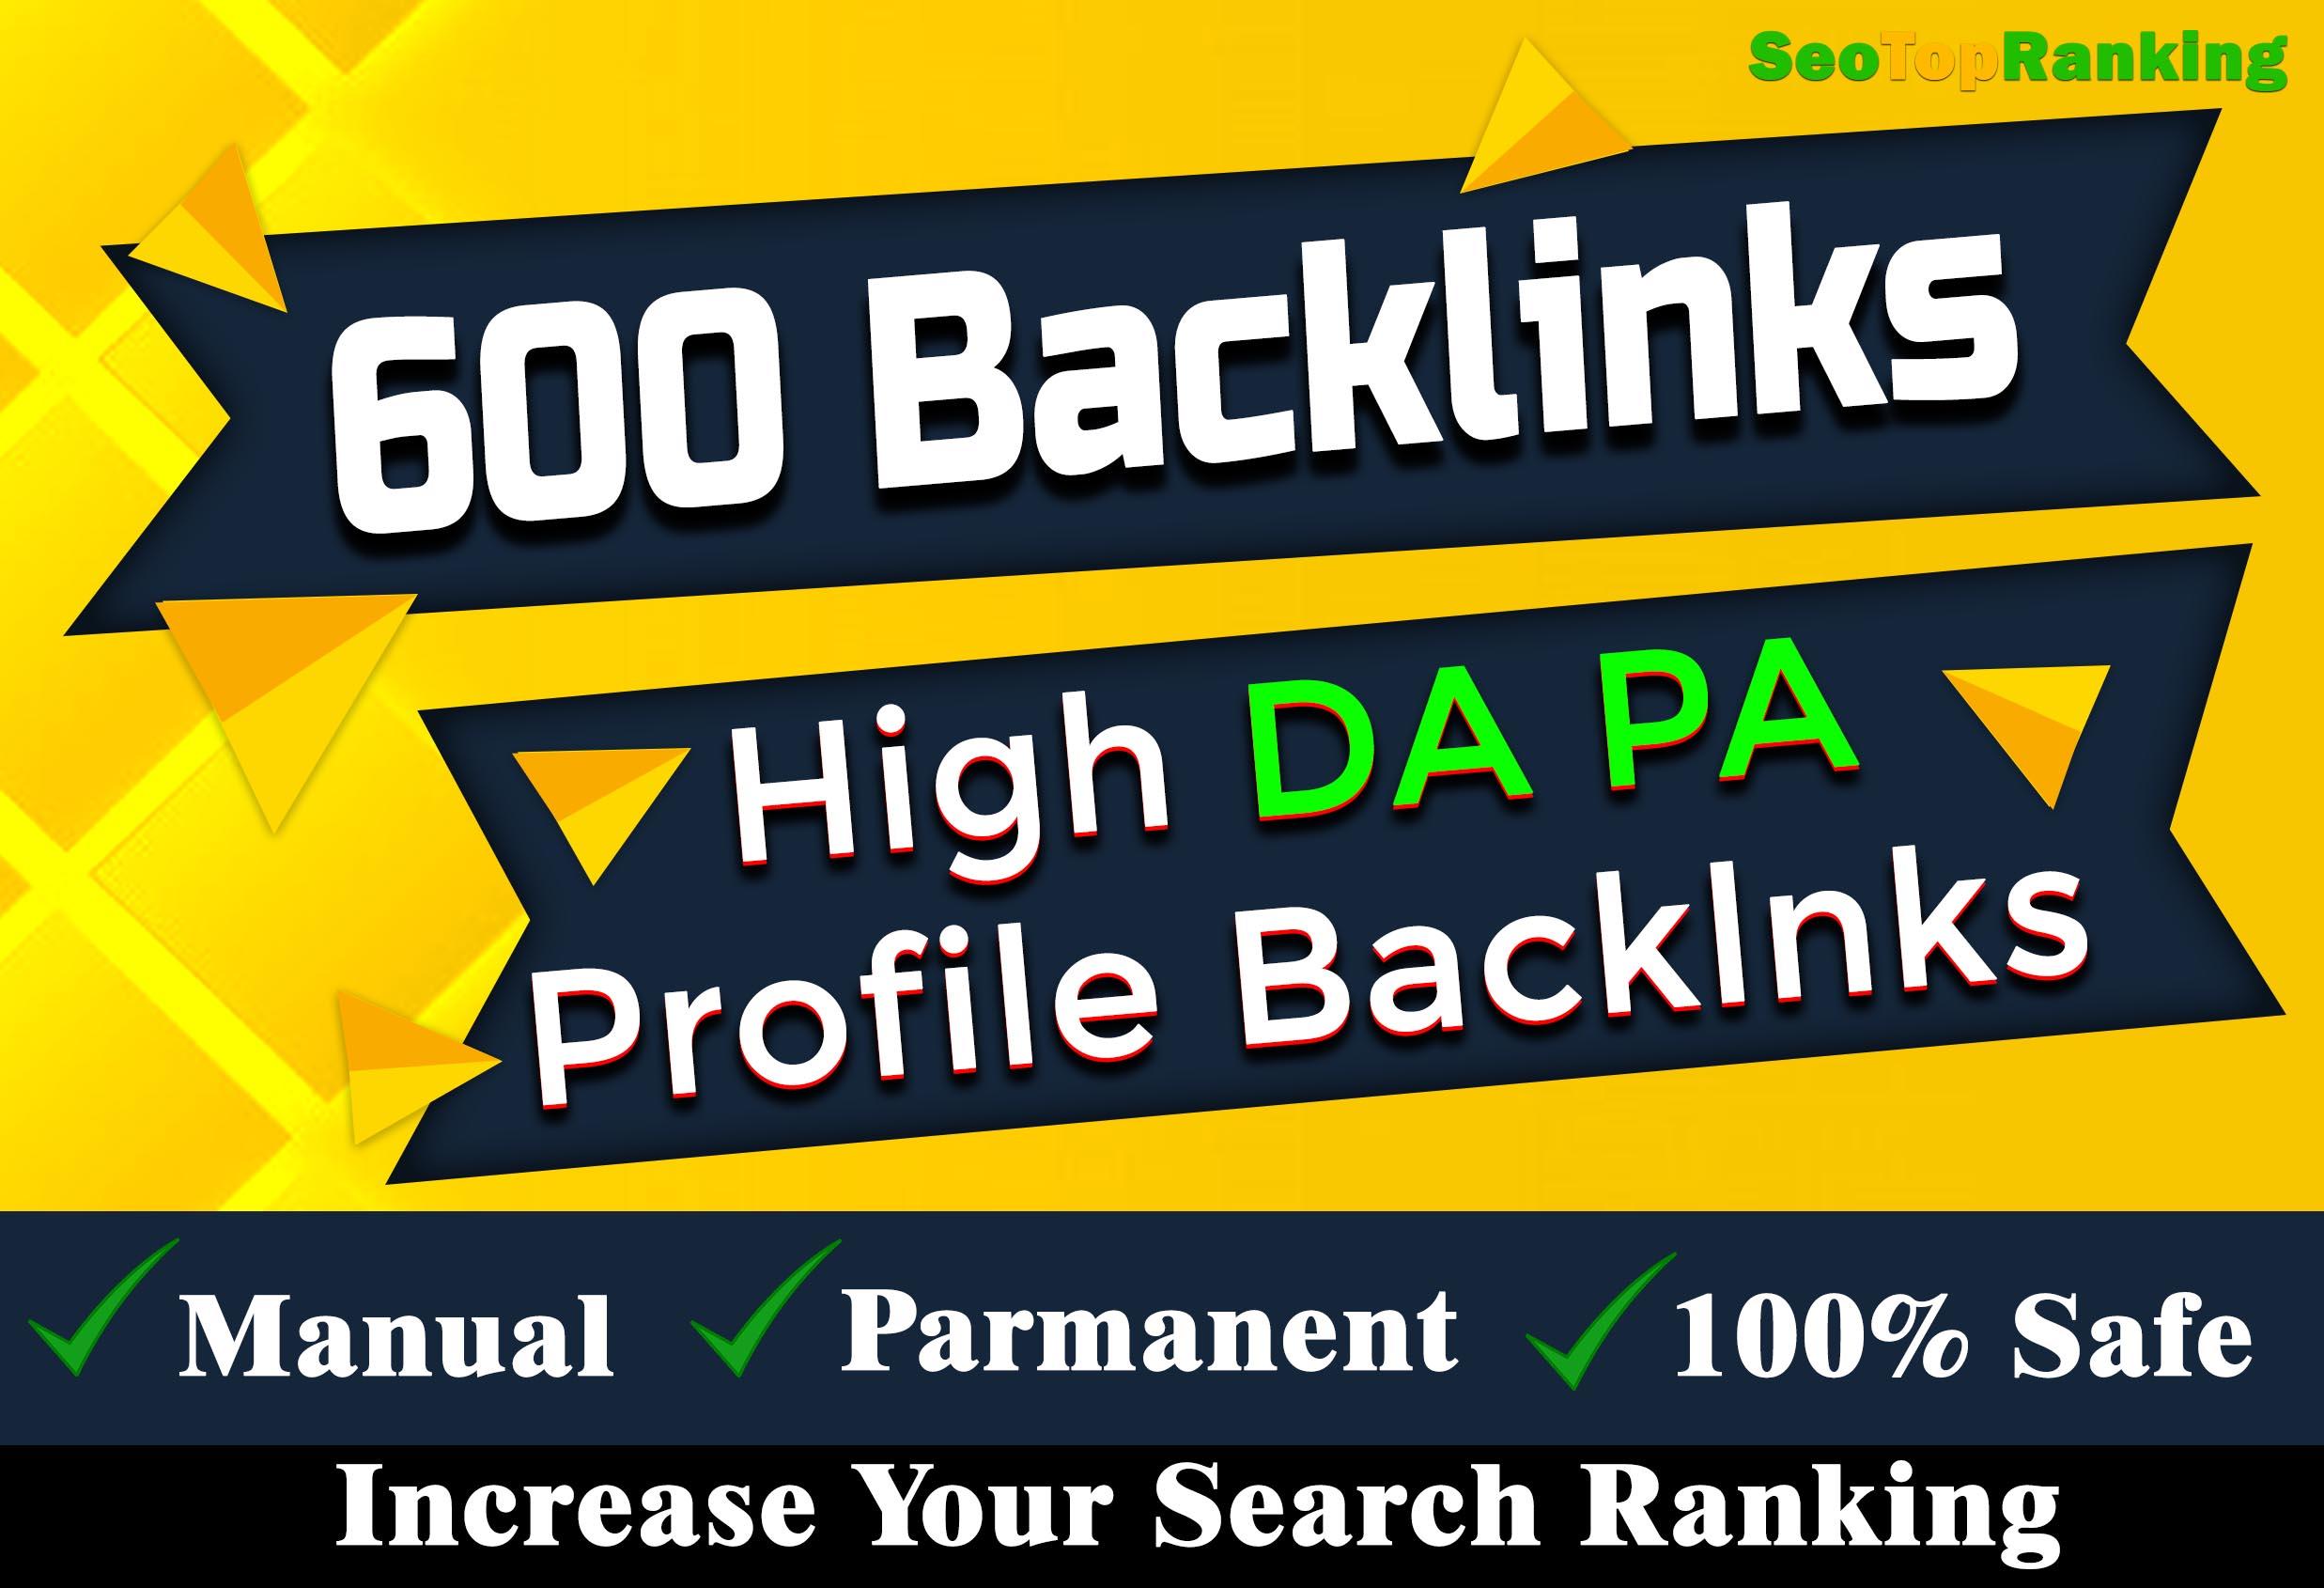 Manually 600 quality full profile backlinks DA 80+ SEO link building Service